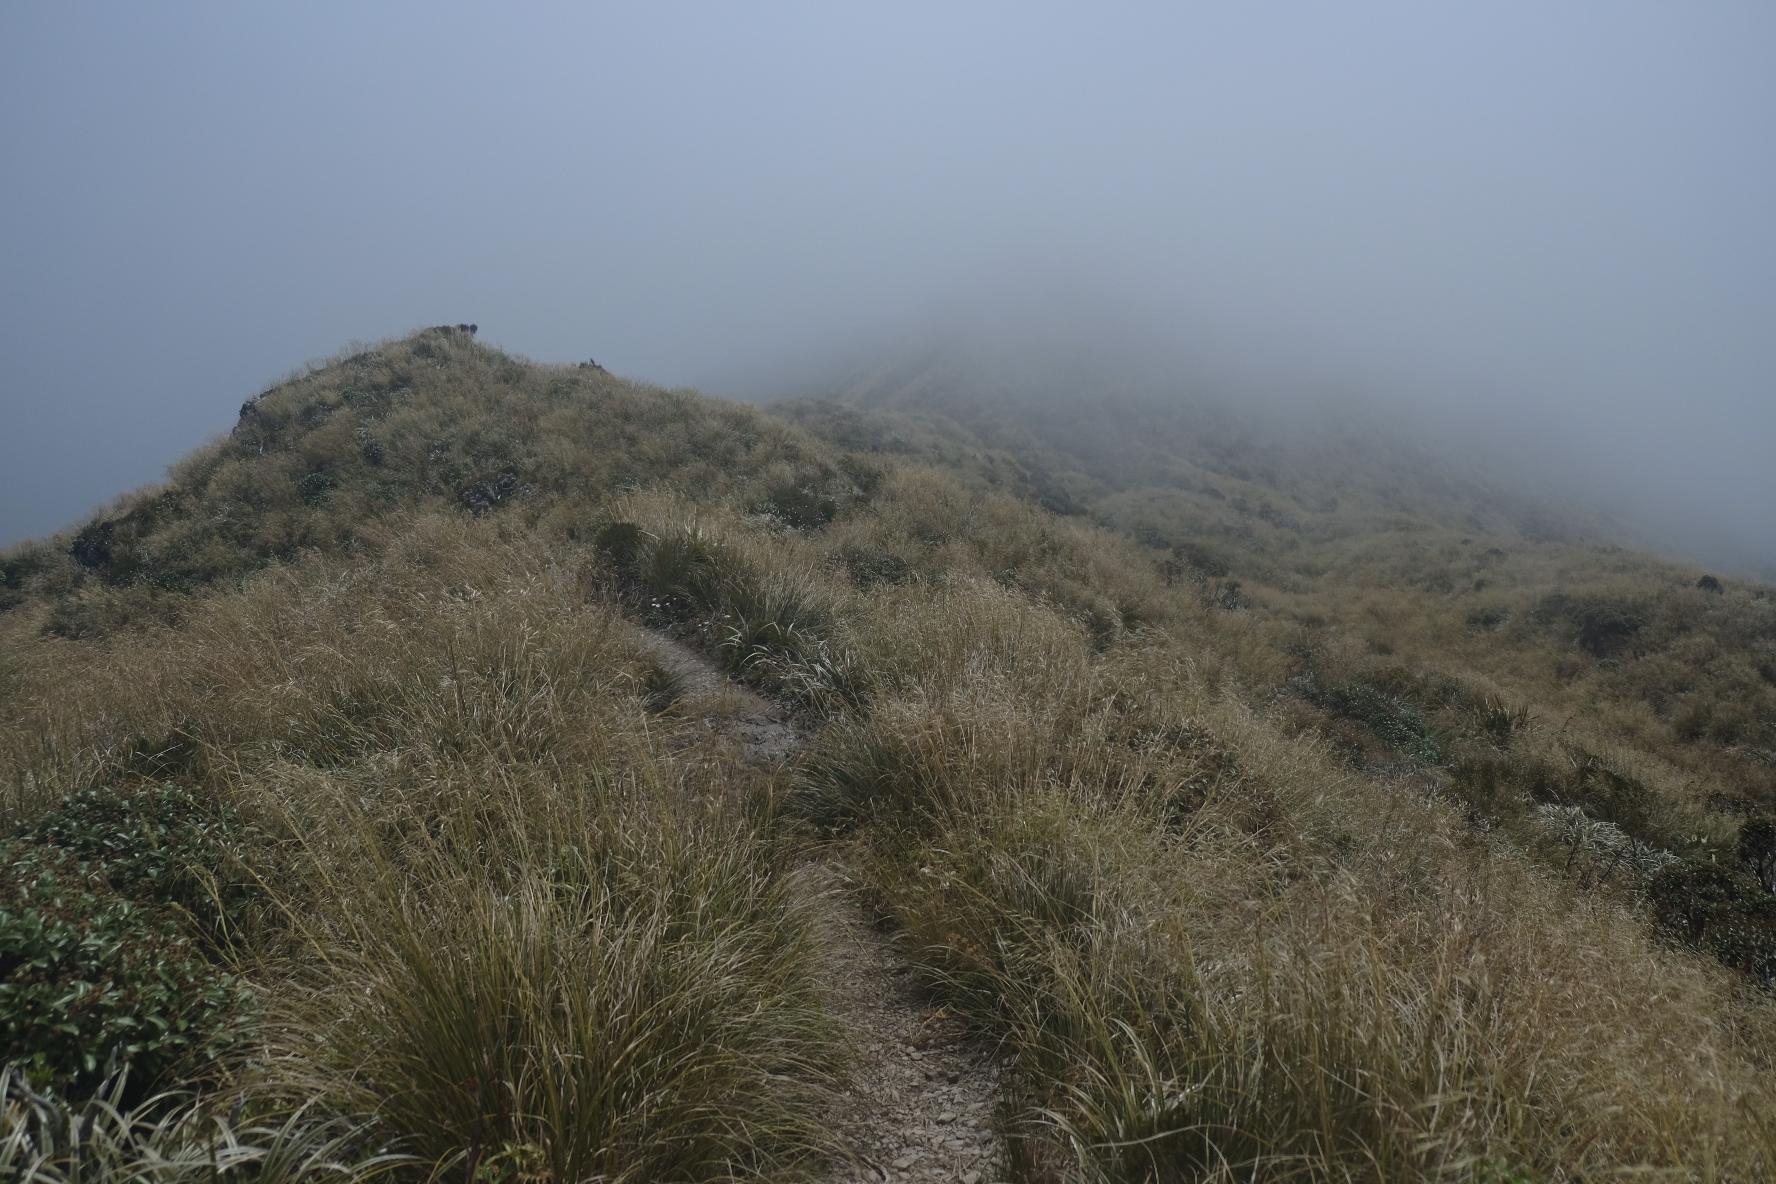 Noisy cloud on the ridges